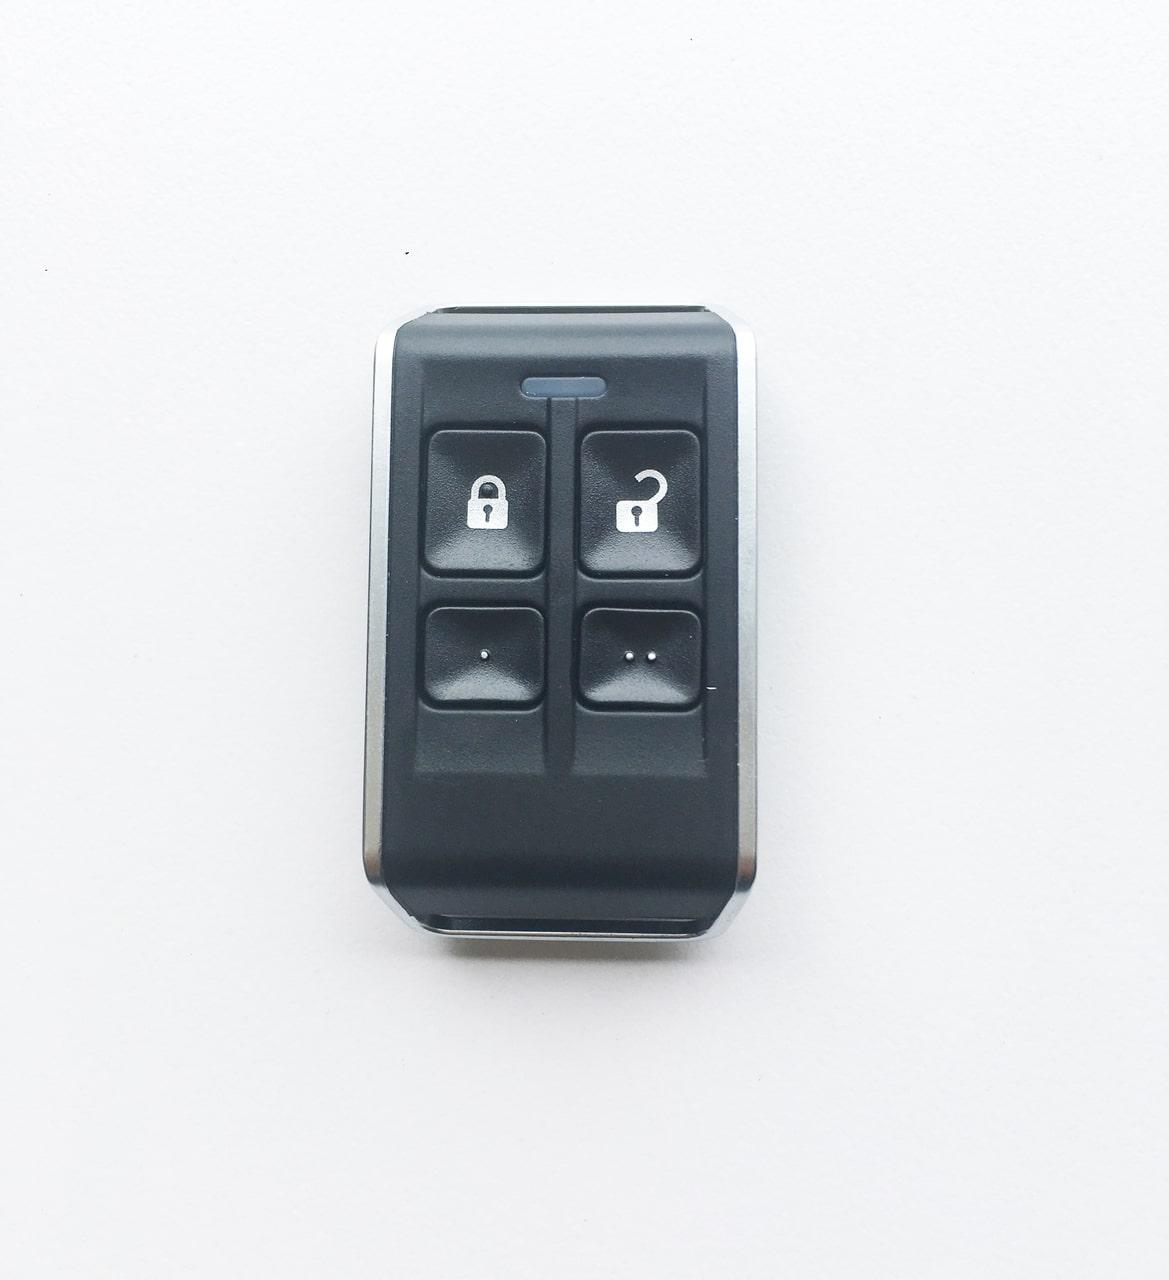 Radion-Bosch-Remote-Control